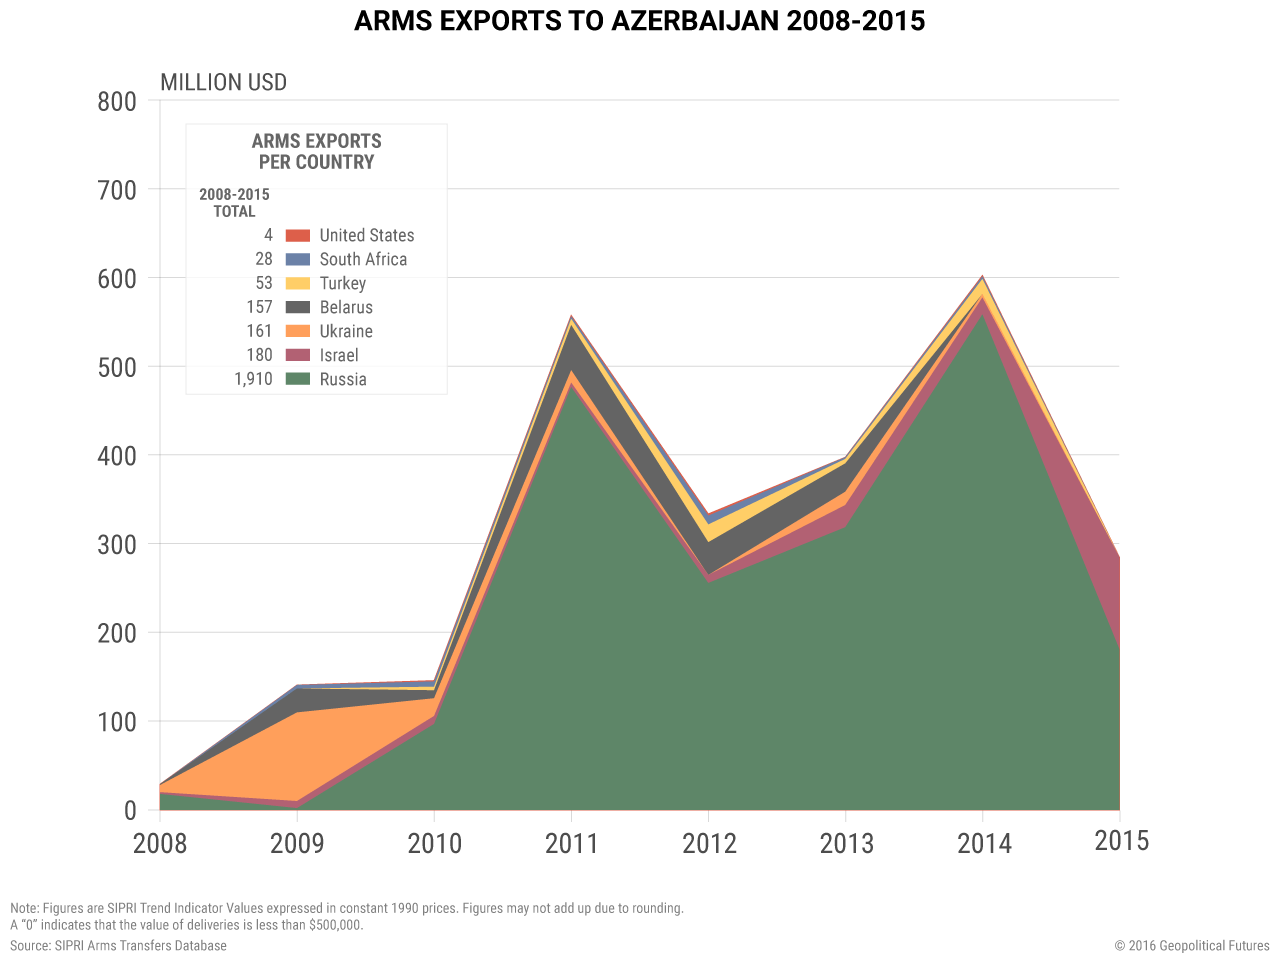 arms-exports-azerbaijan-2008-2015